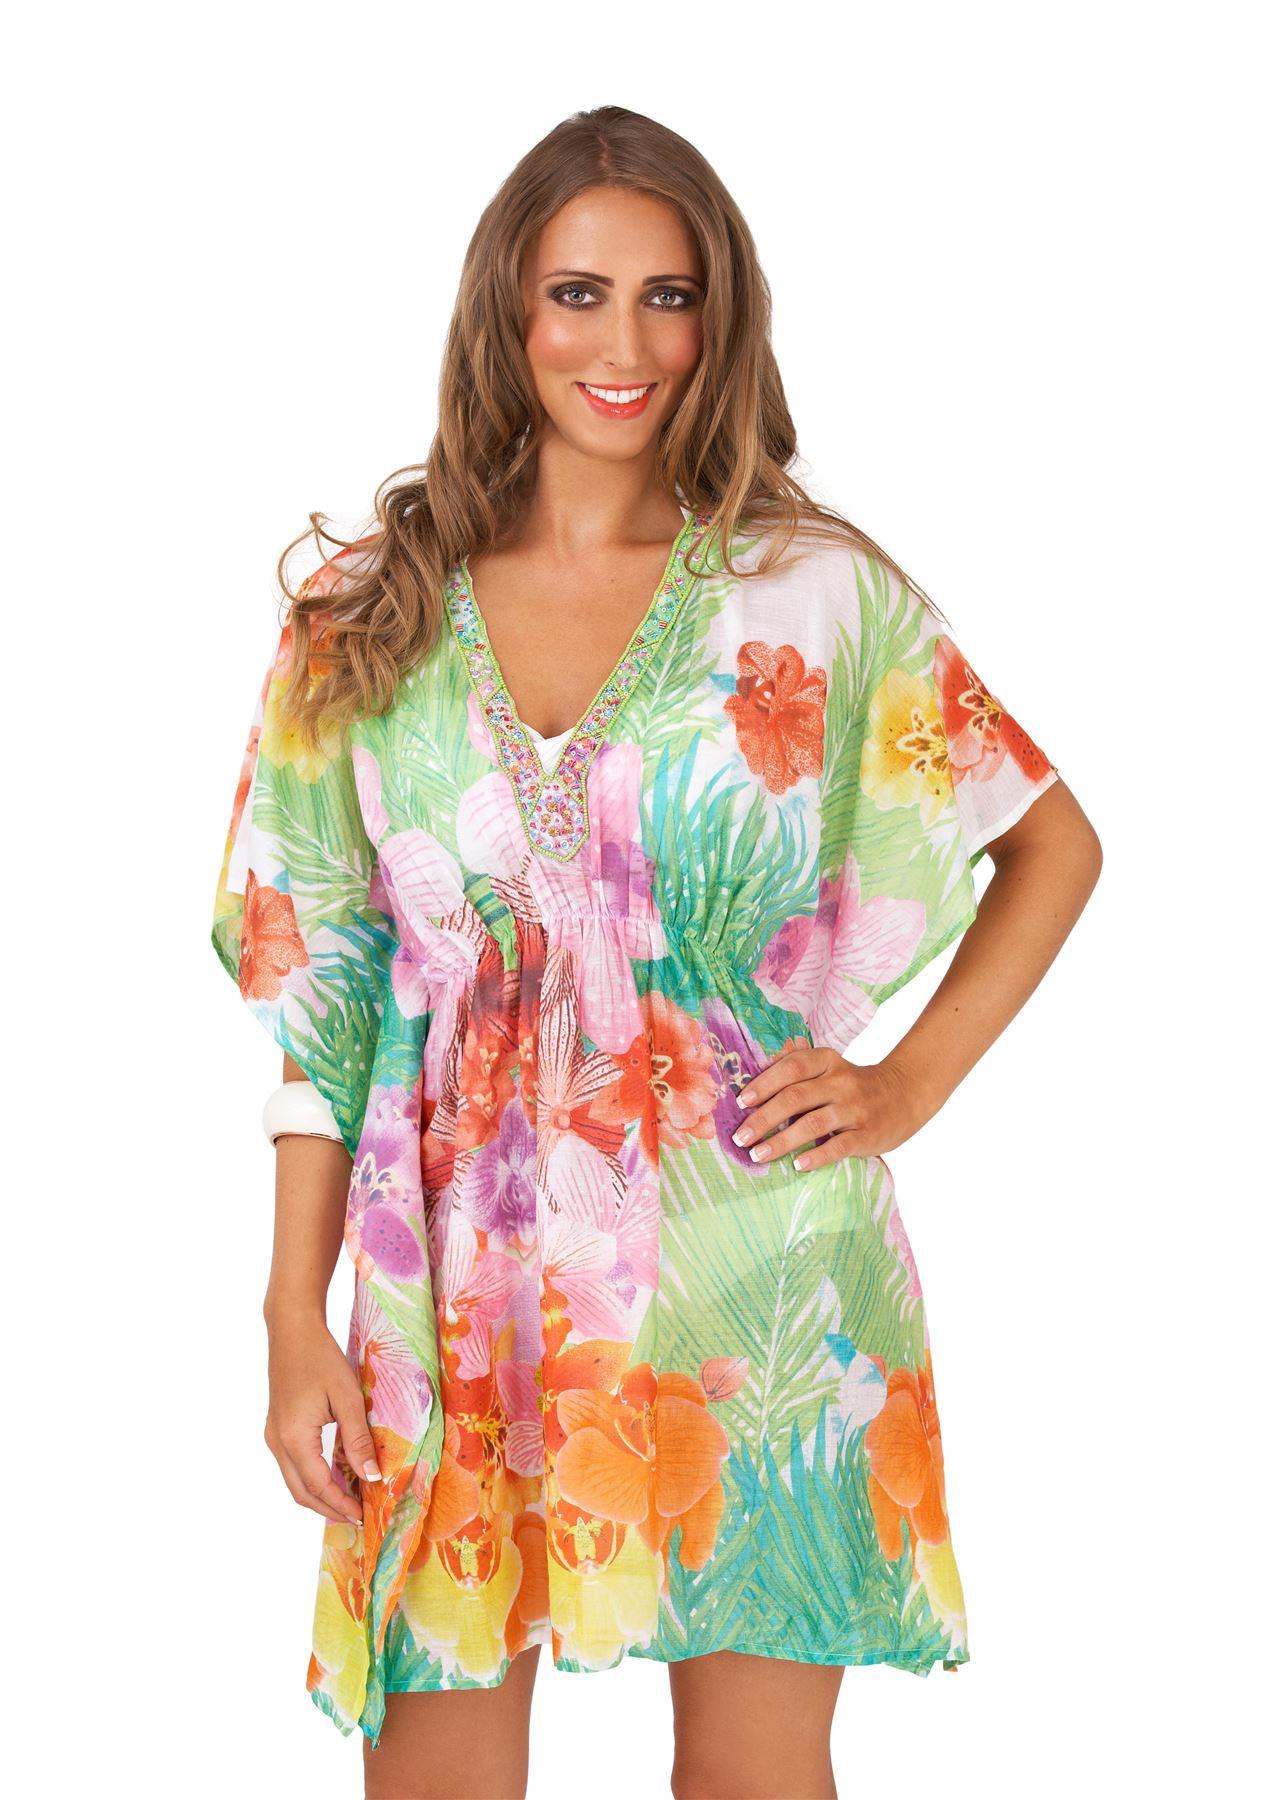 Island Importer provides beach wedding attire for men, women, & boys in % pure linen, certified organic cotton, & more.